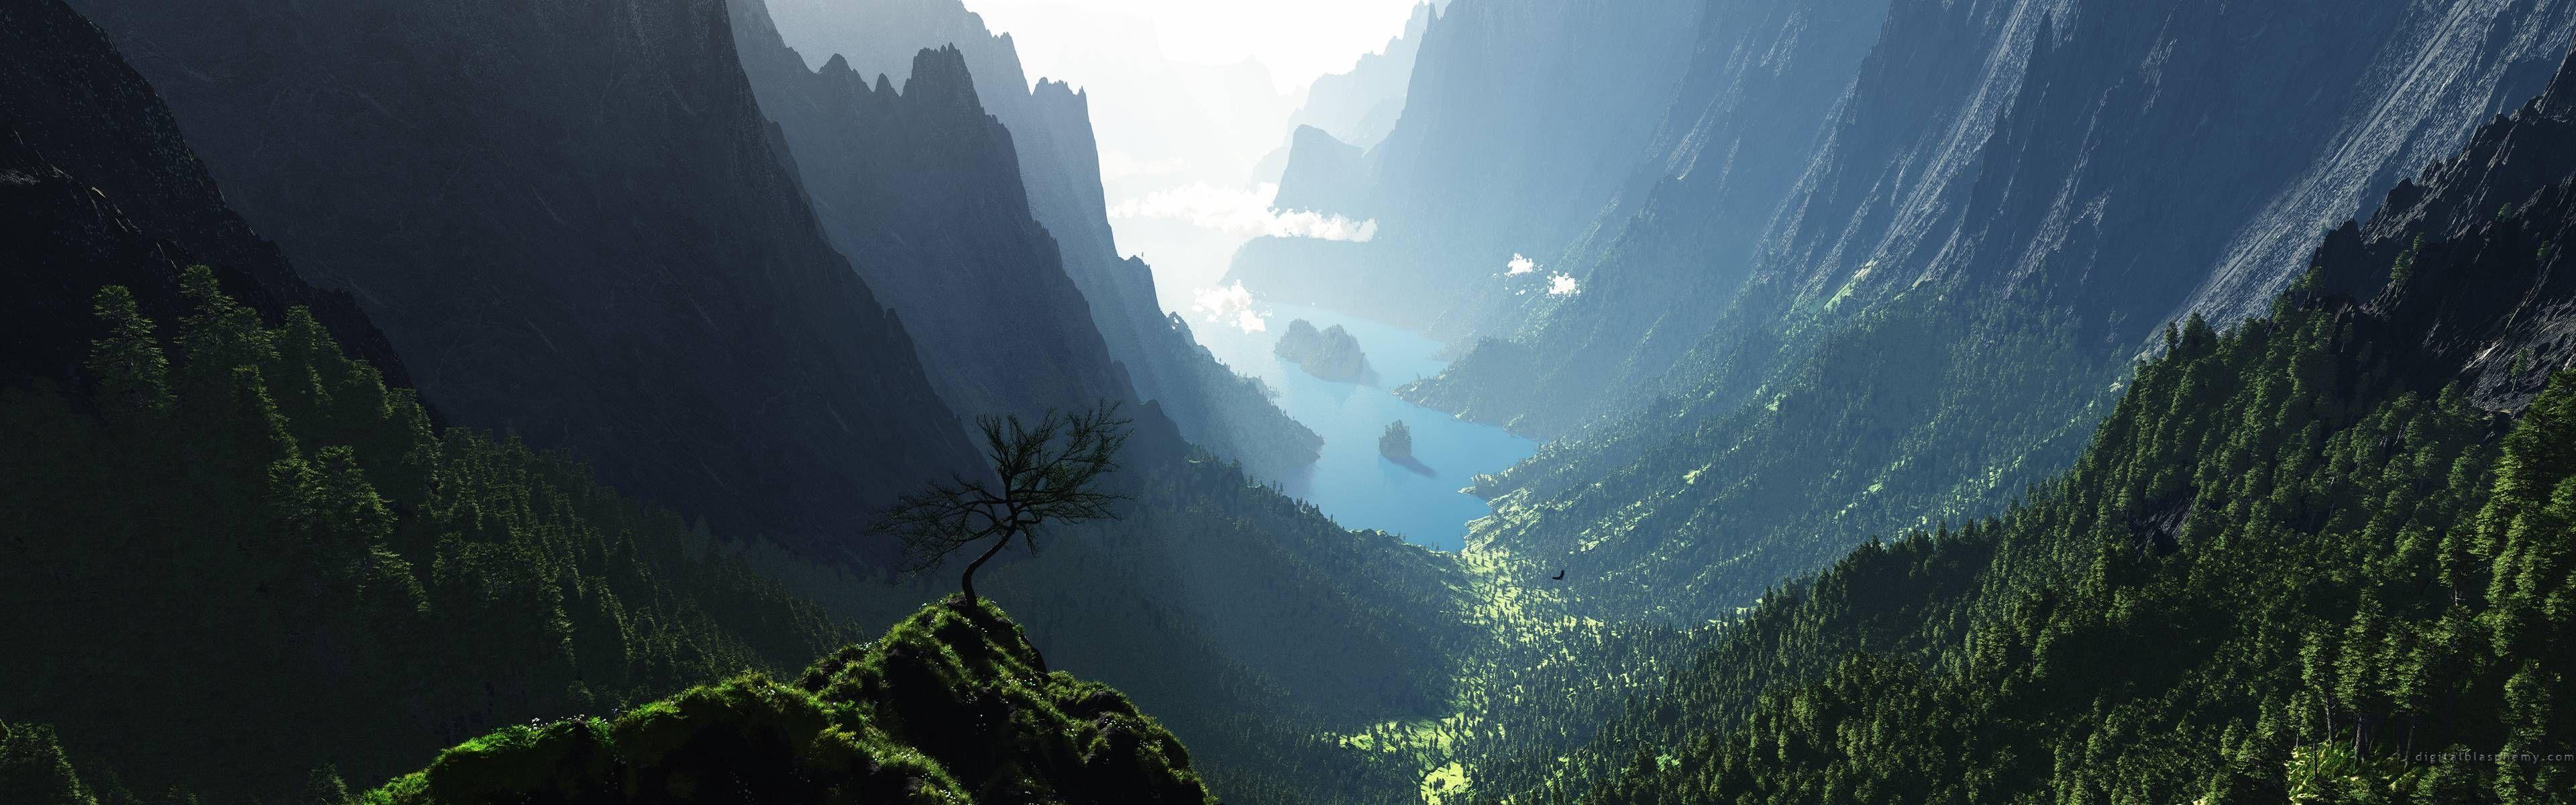 Beautiful Wallpaper Harry Potter Dual Screen - 1792c7b835a17a28758717899a90e295  Pictures_648244.jpg